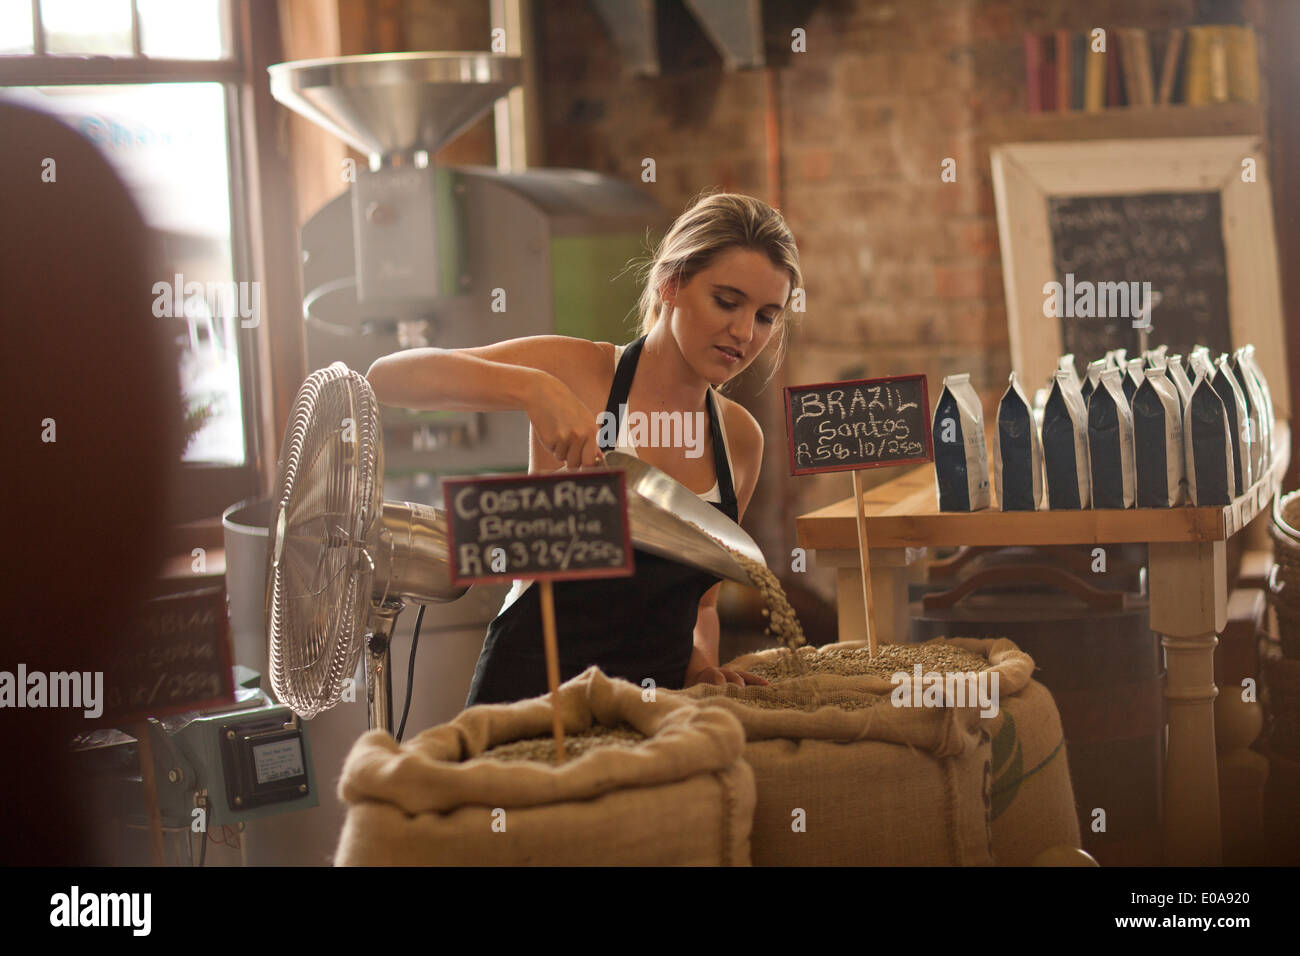 Junge Frau im Coffee-Shop, Kaffee schöpfen Stockbild